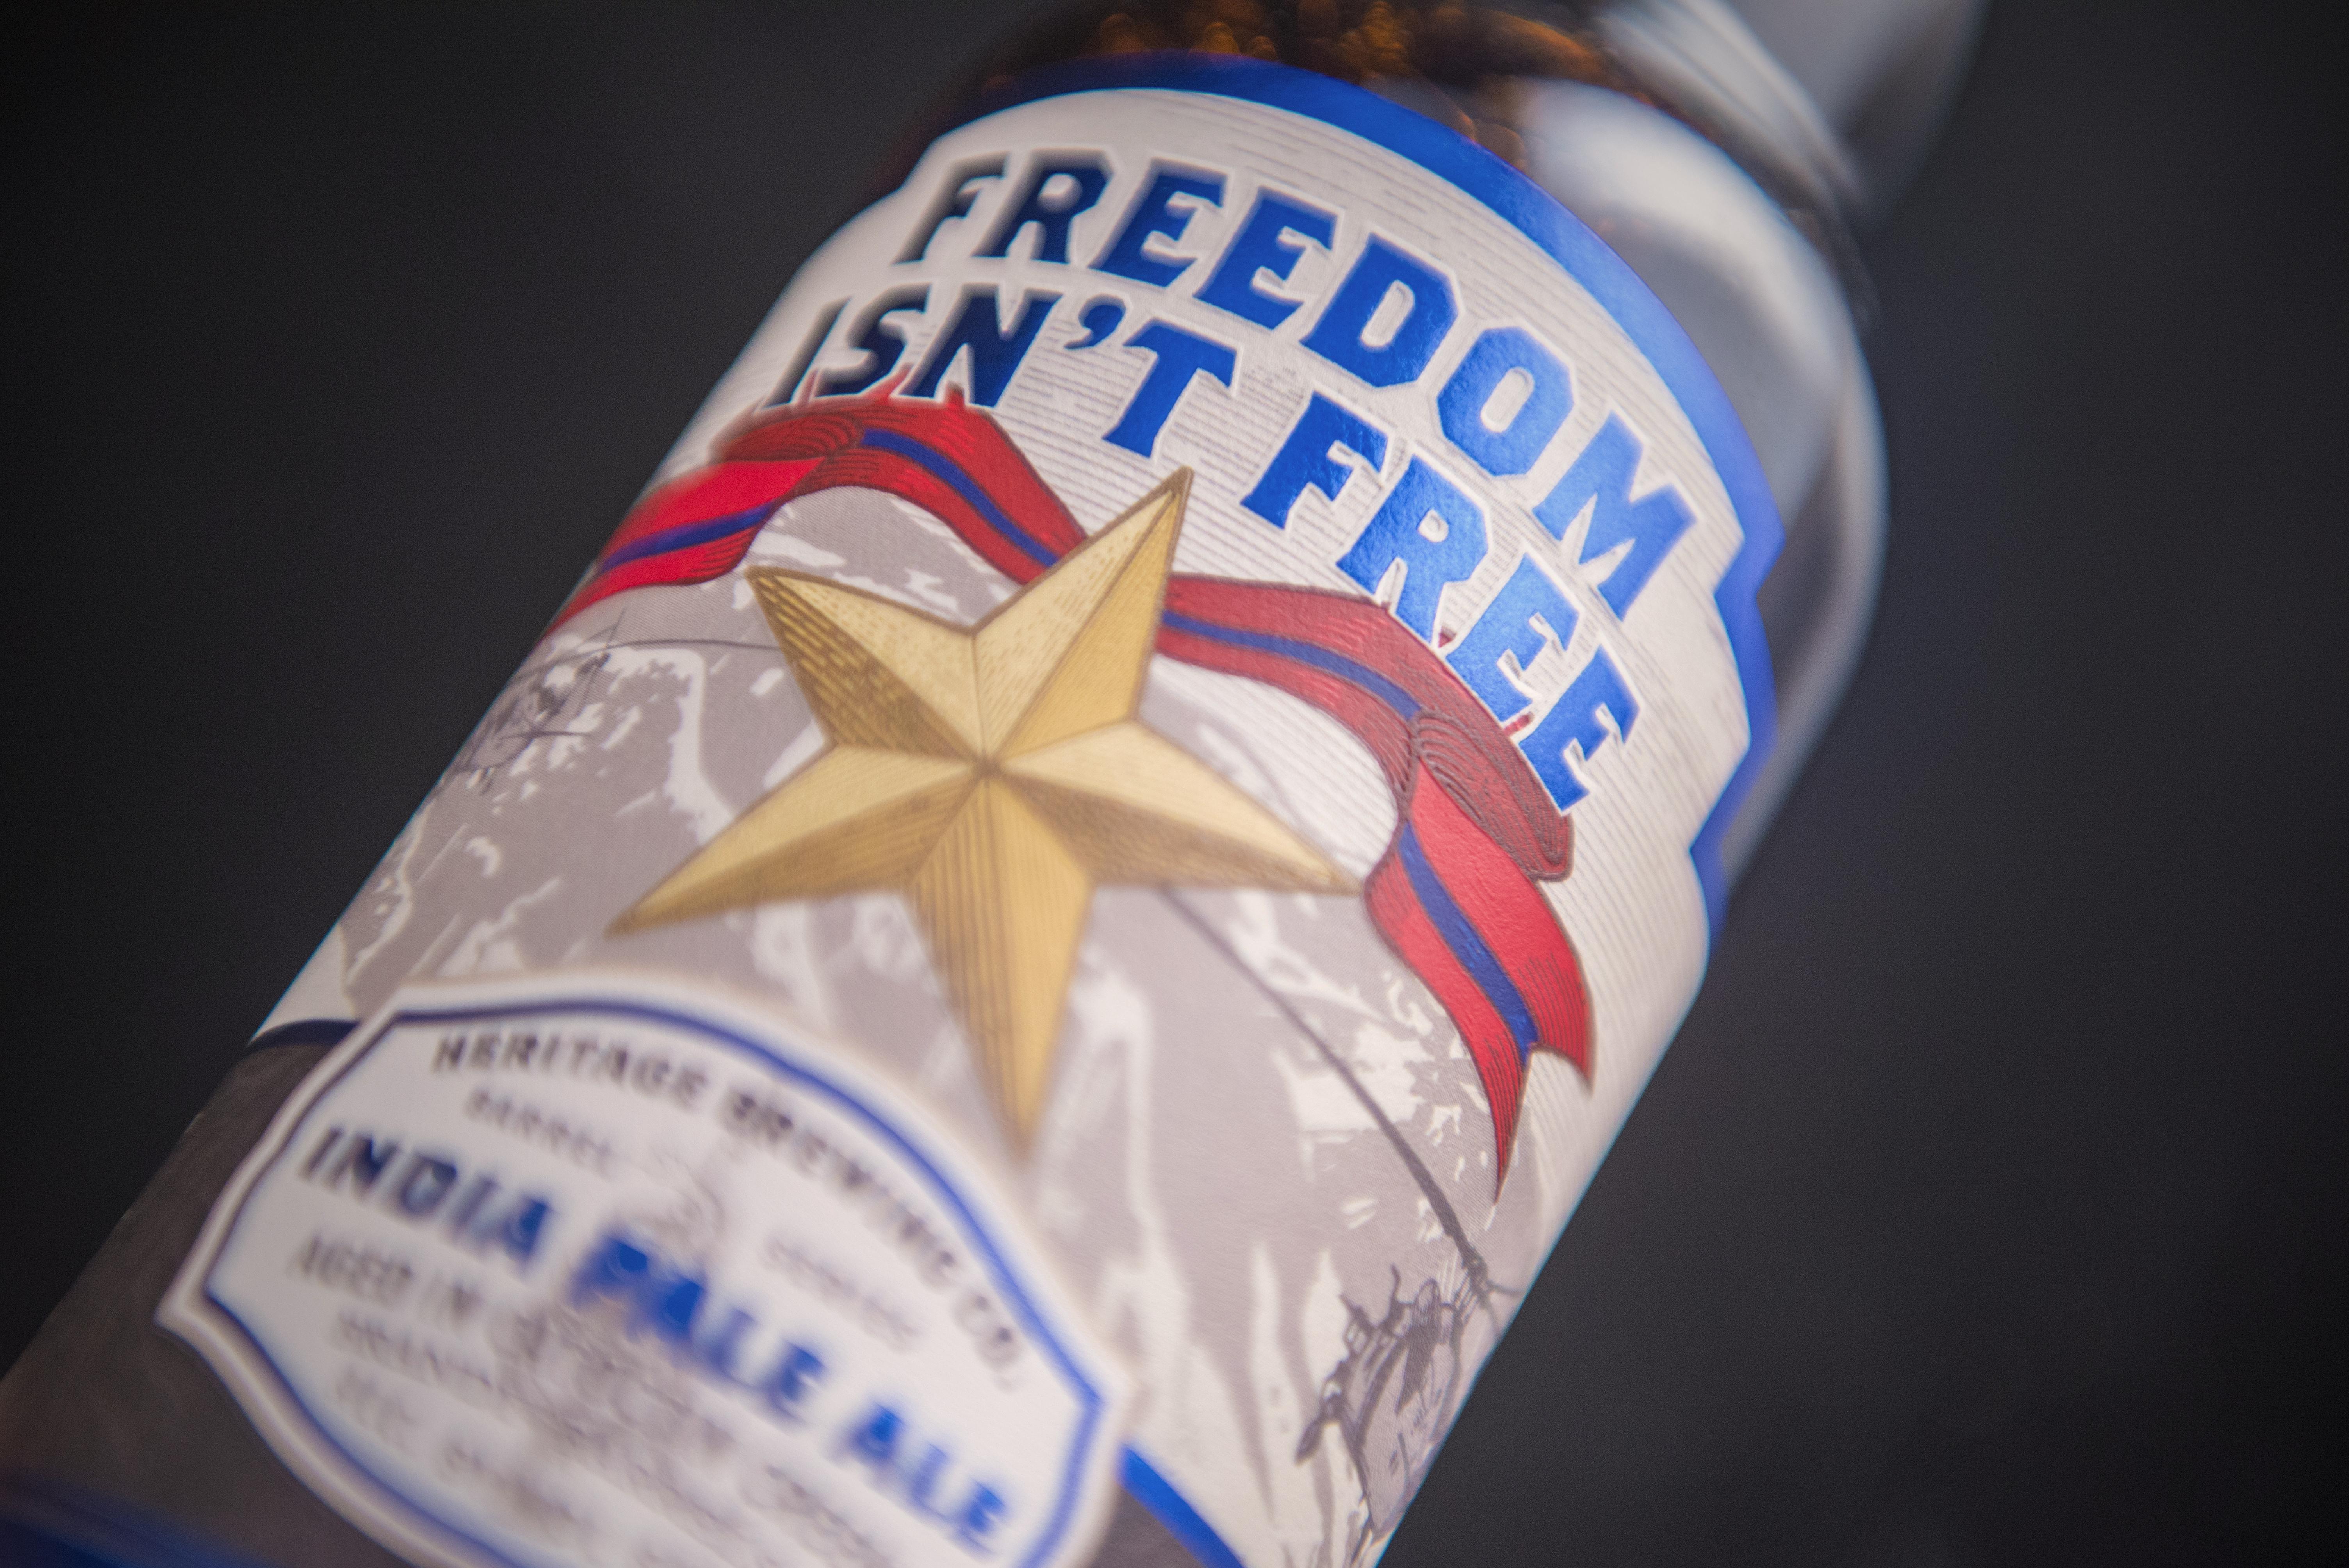 Brandy Barrel Freedom Isn't Free 3